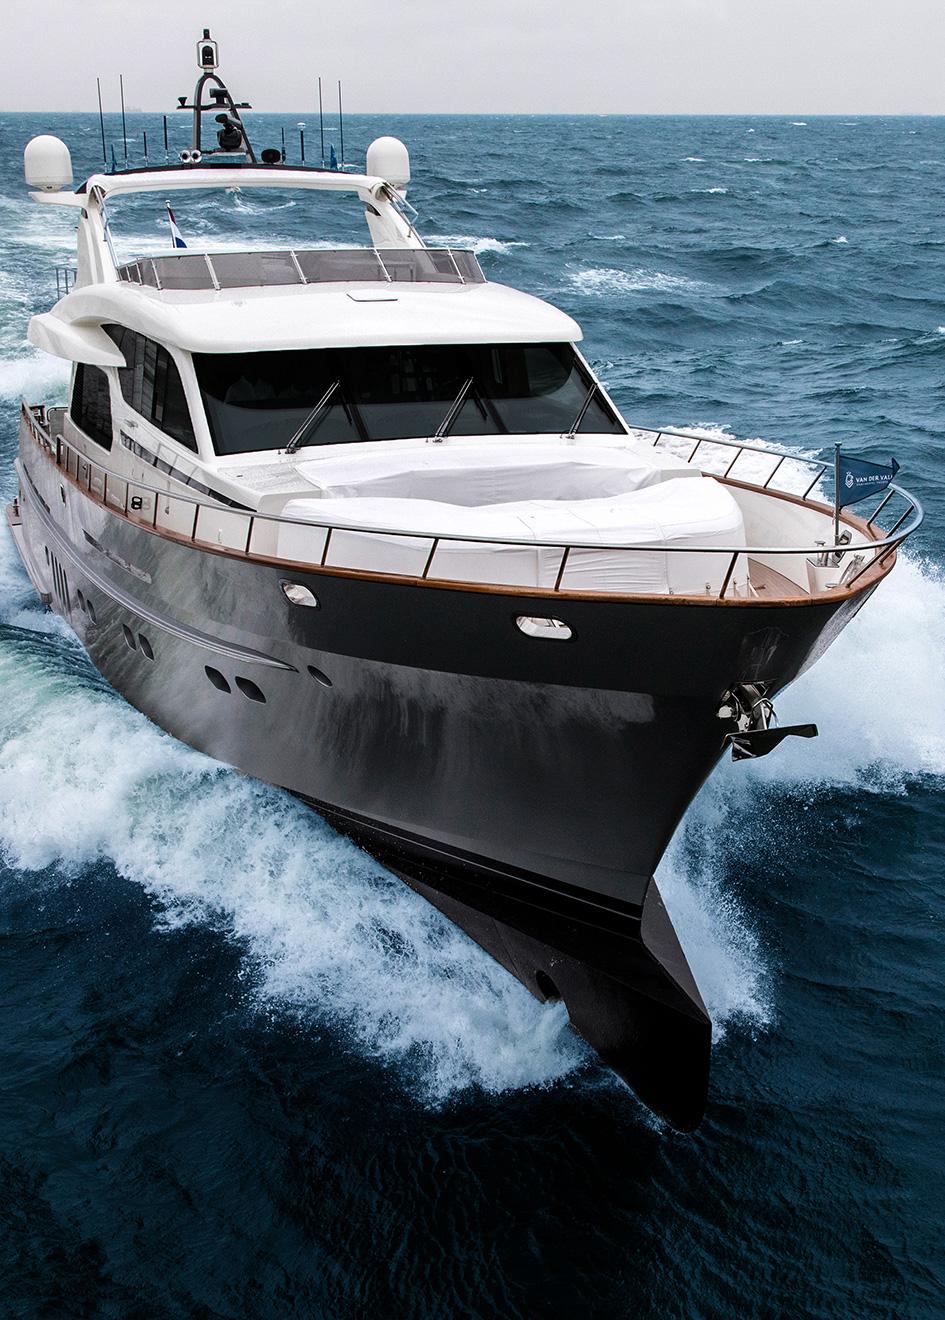 bow-running-shot-of-the-van-der-valk-motor-yacht-anemeli